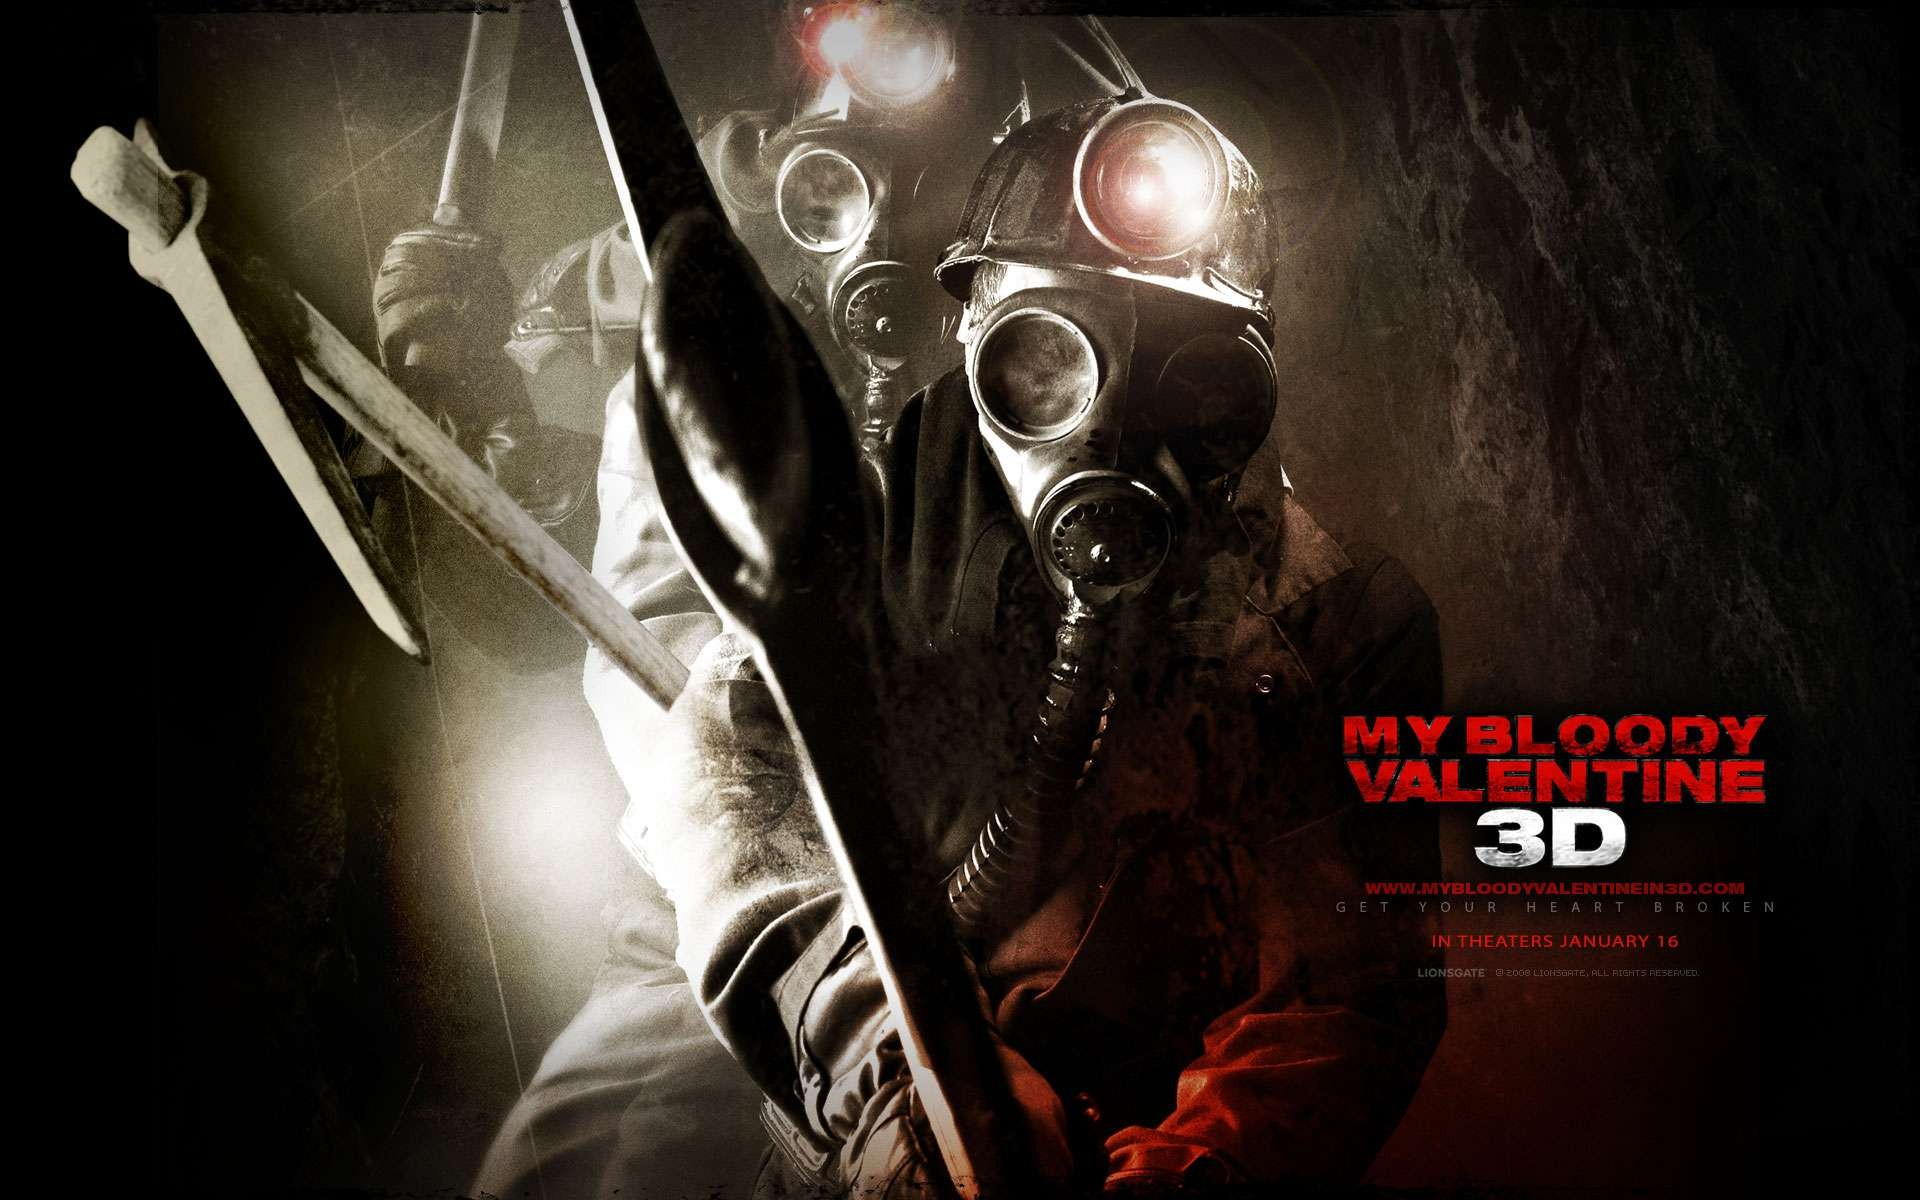 Un wallpaper del film My Bloody Valentine 3D